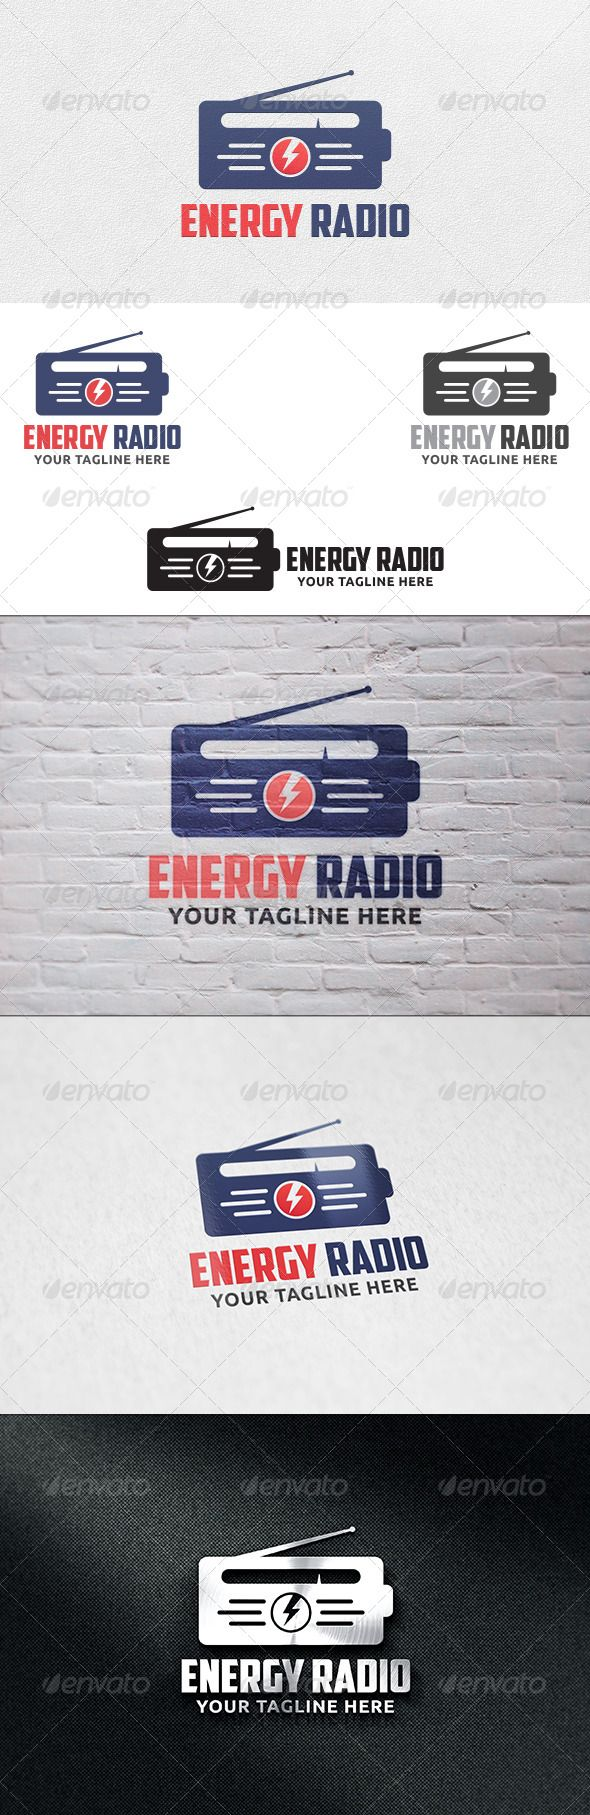 Energy Radio - Logo Template